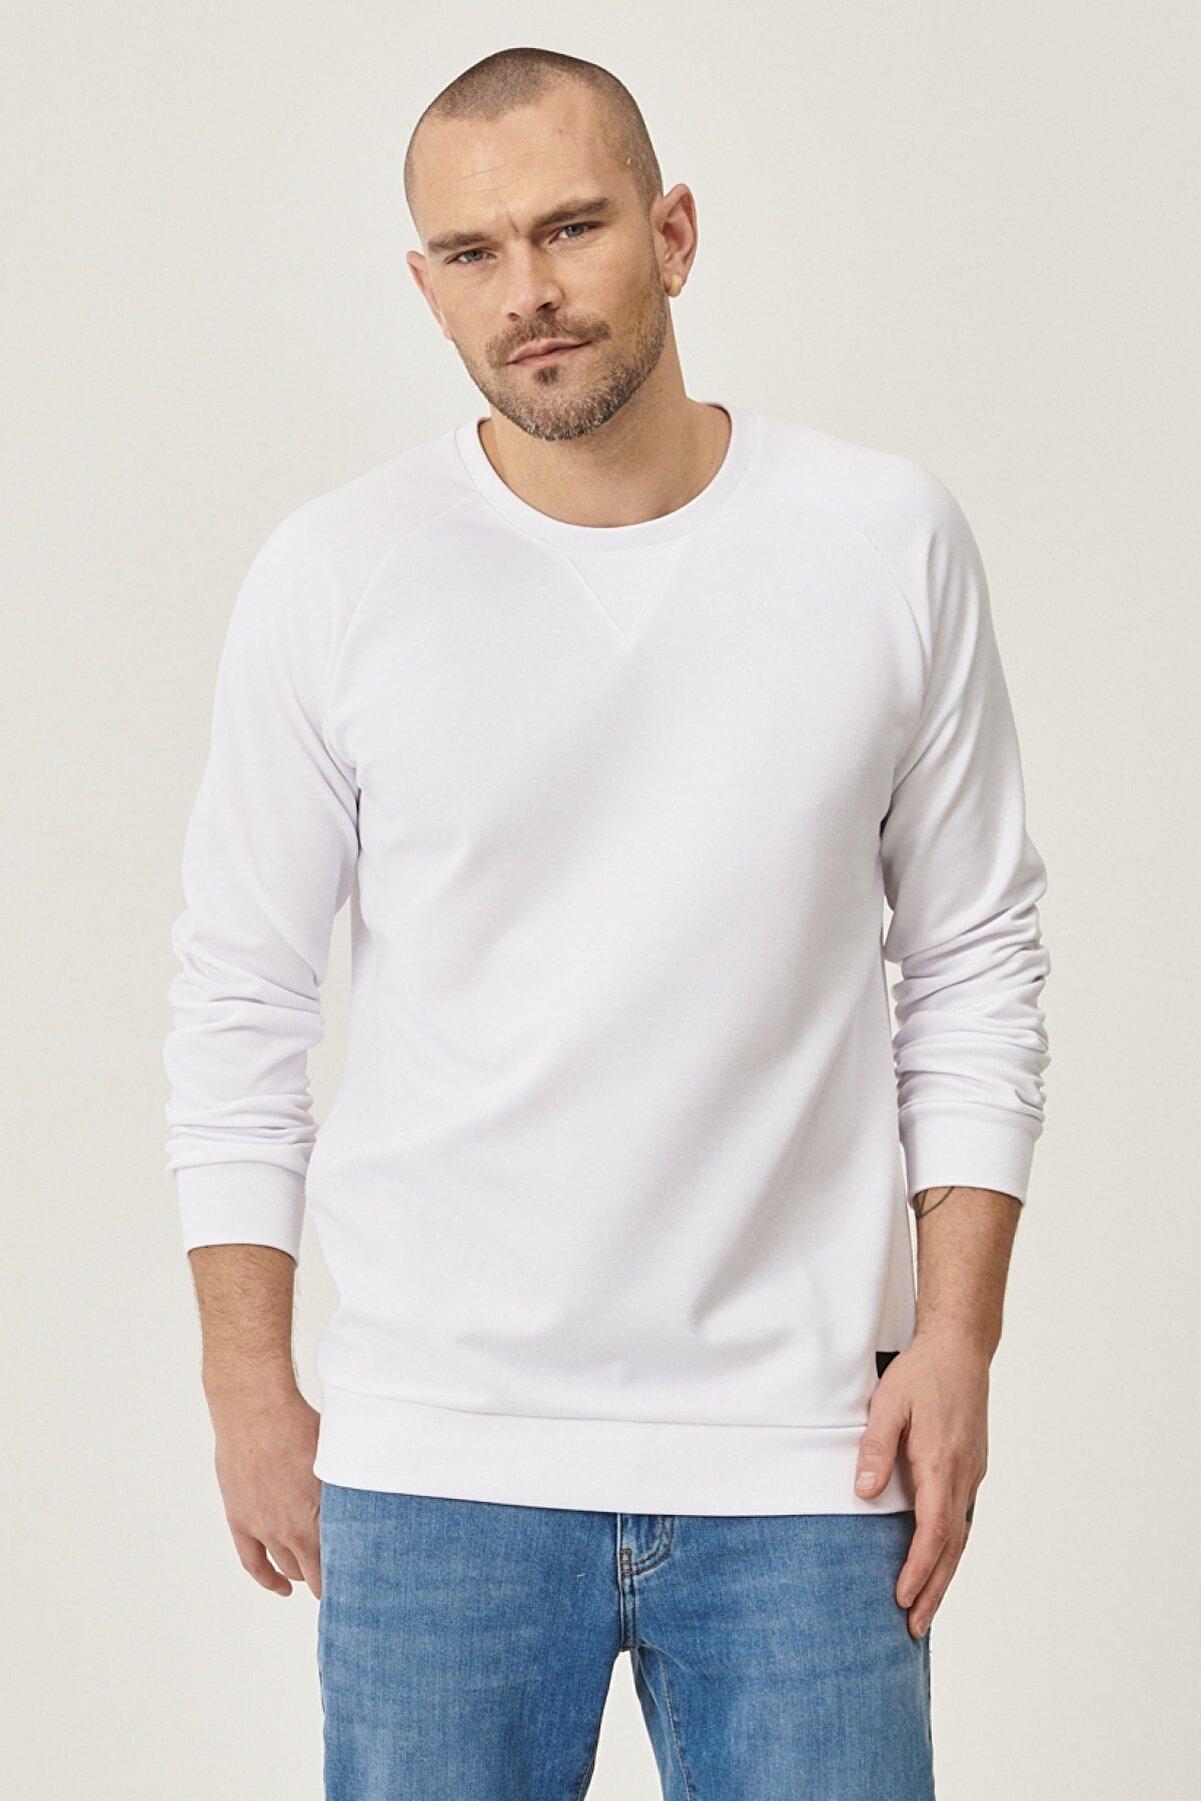 Altınyıldız Classics Erkek Beyaz Standart Fit Günlük Rahat Bisiklet Yaka Spor Sweatshirt